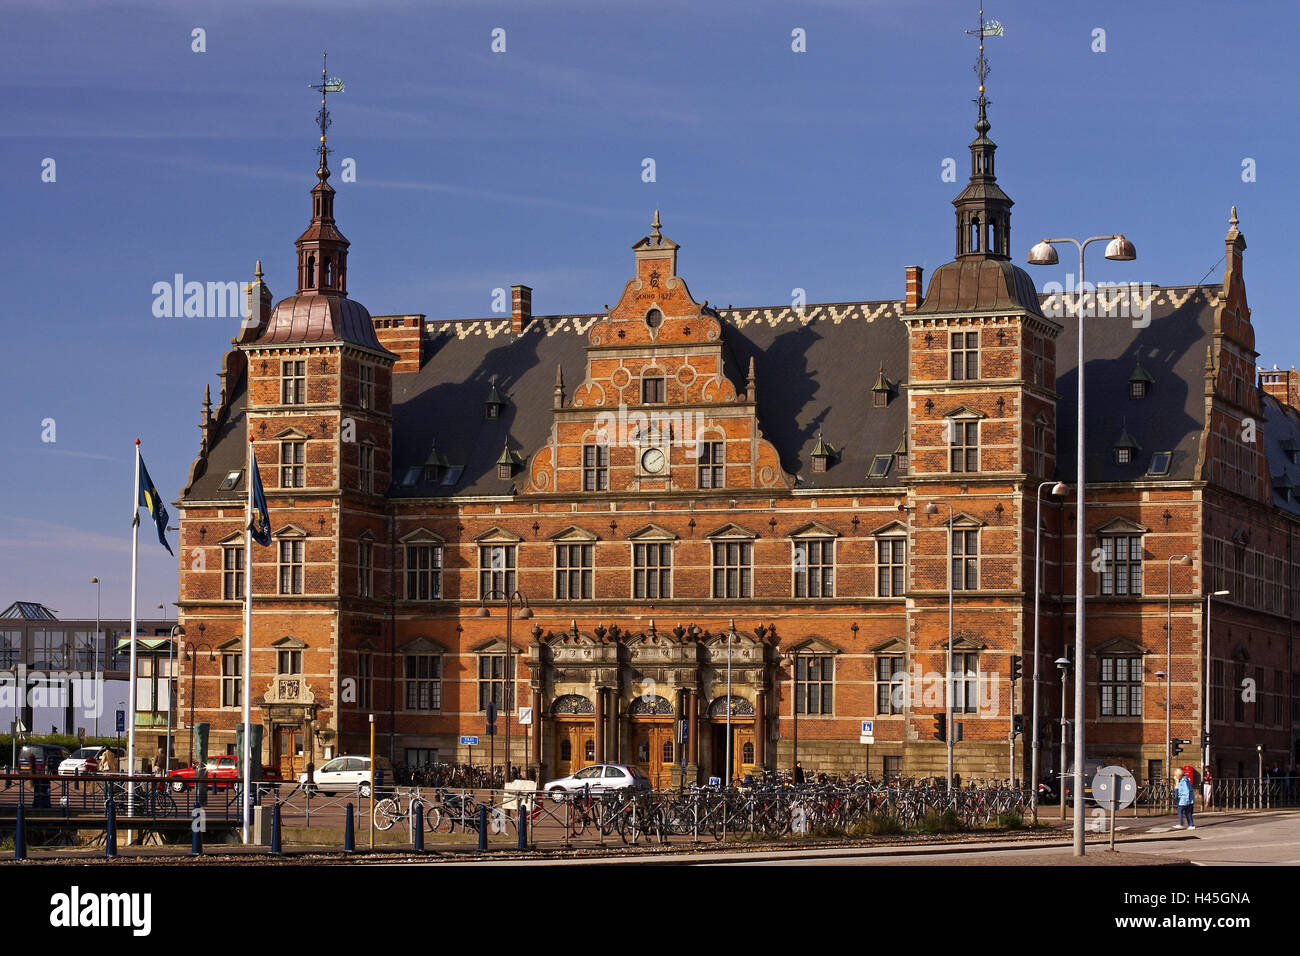 Denmark, Helsingoer, central station 'toiling Hus', outside, bicycles, - Stock Image